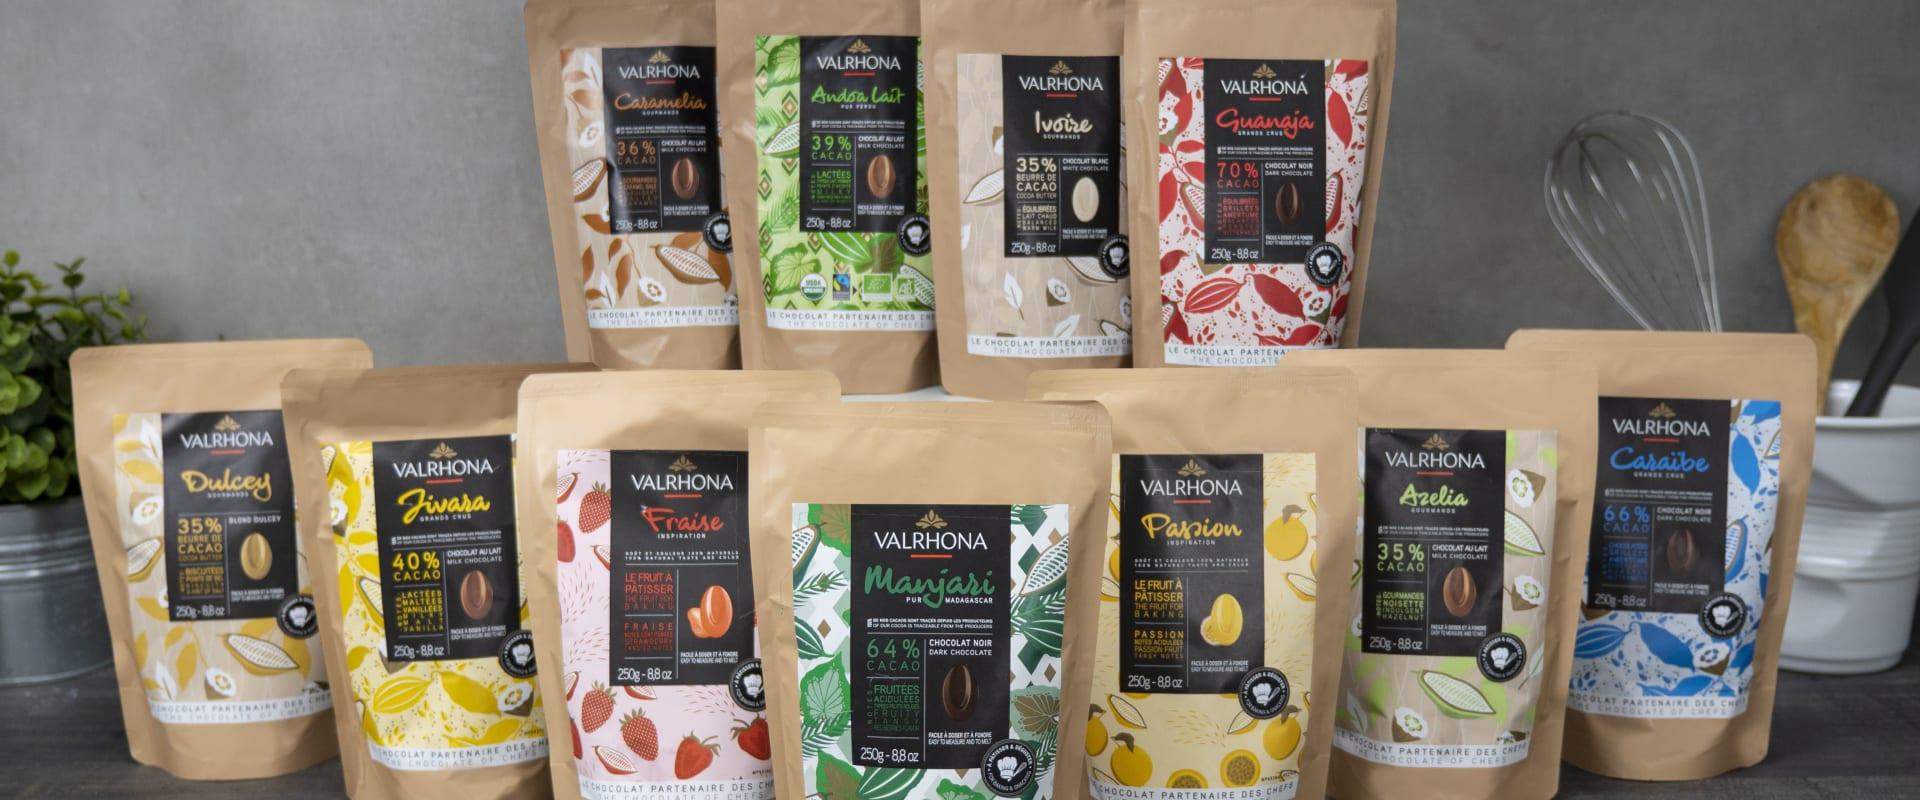 valrhona.com-gourmets-range-banner